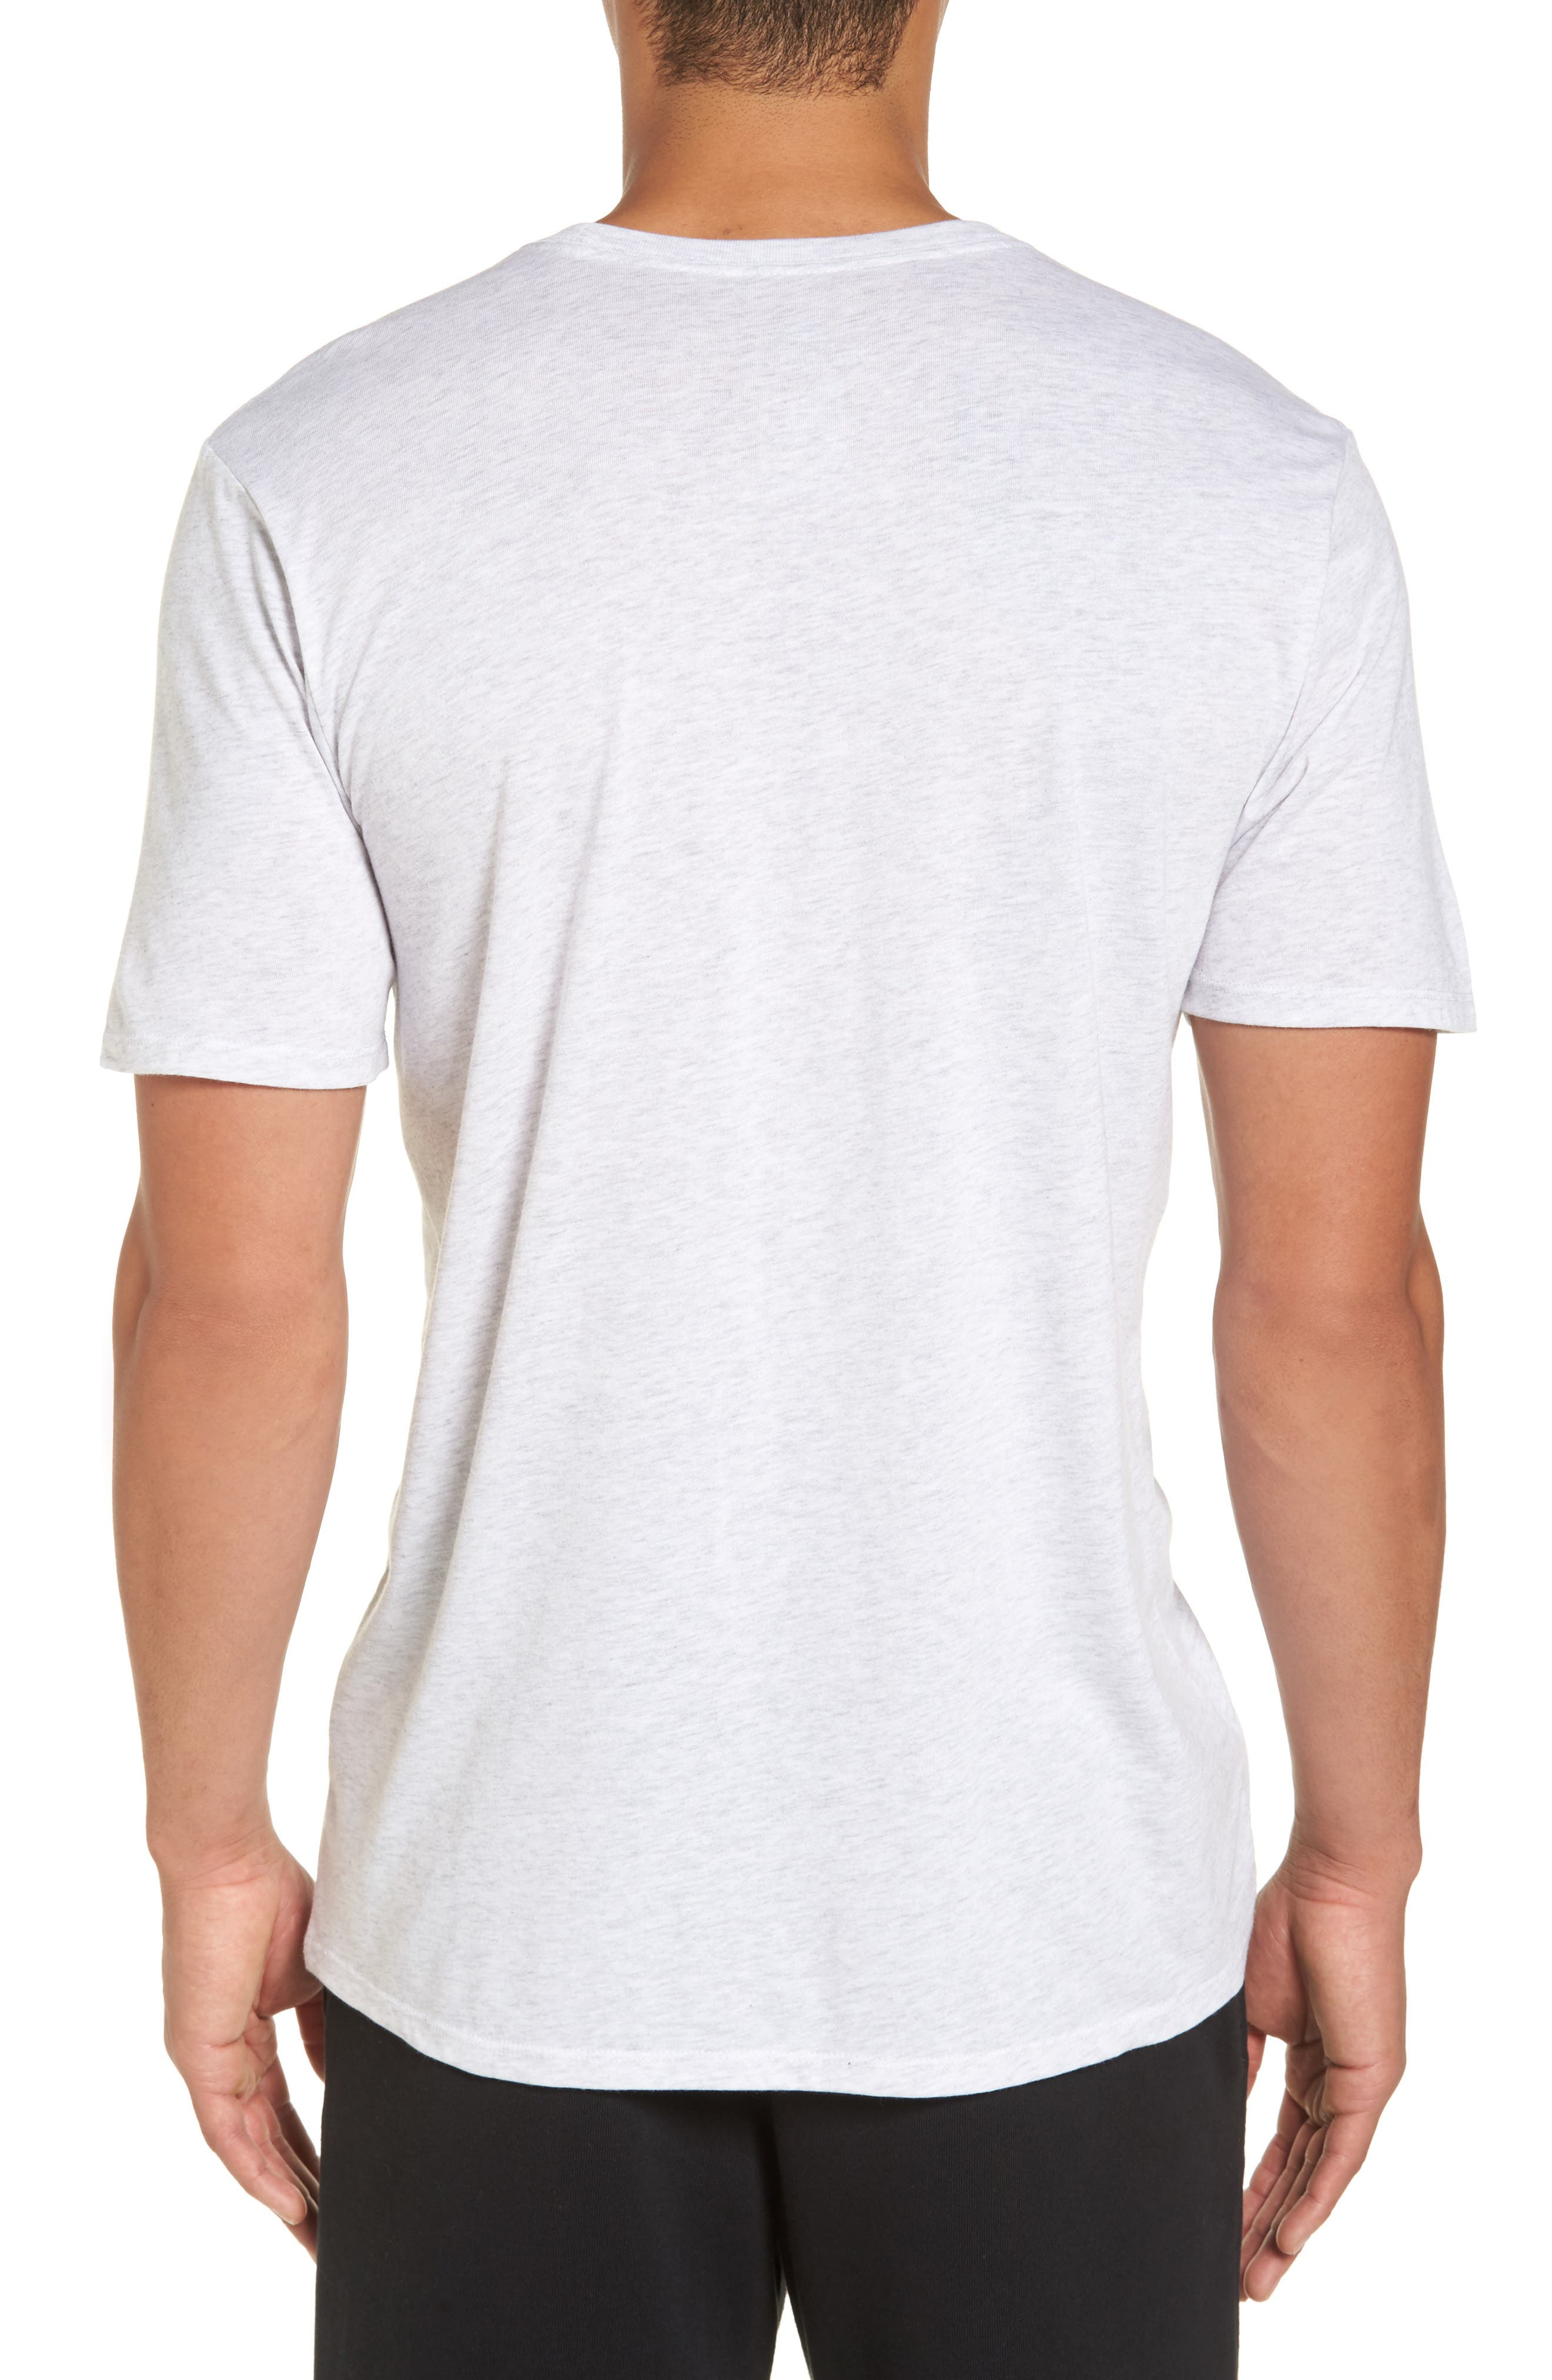 NSW TB Legacy T-Shirt,                             Alternate thumbnail 2, color,                             Birch Heather/ Heather/ Sail